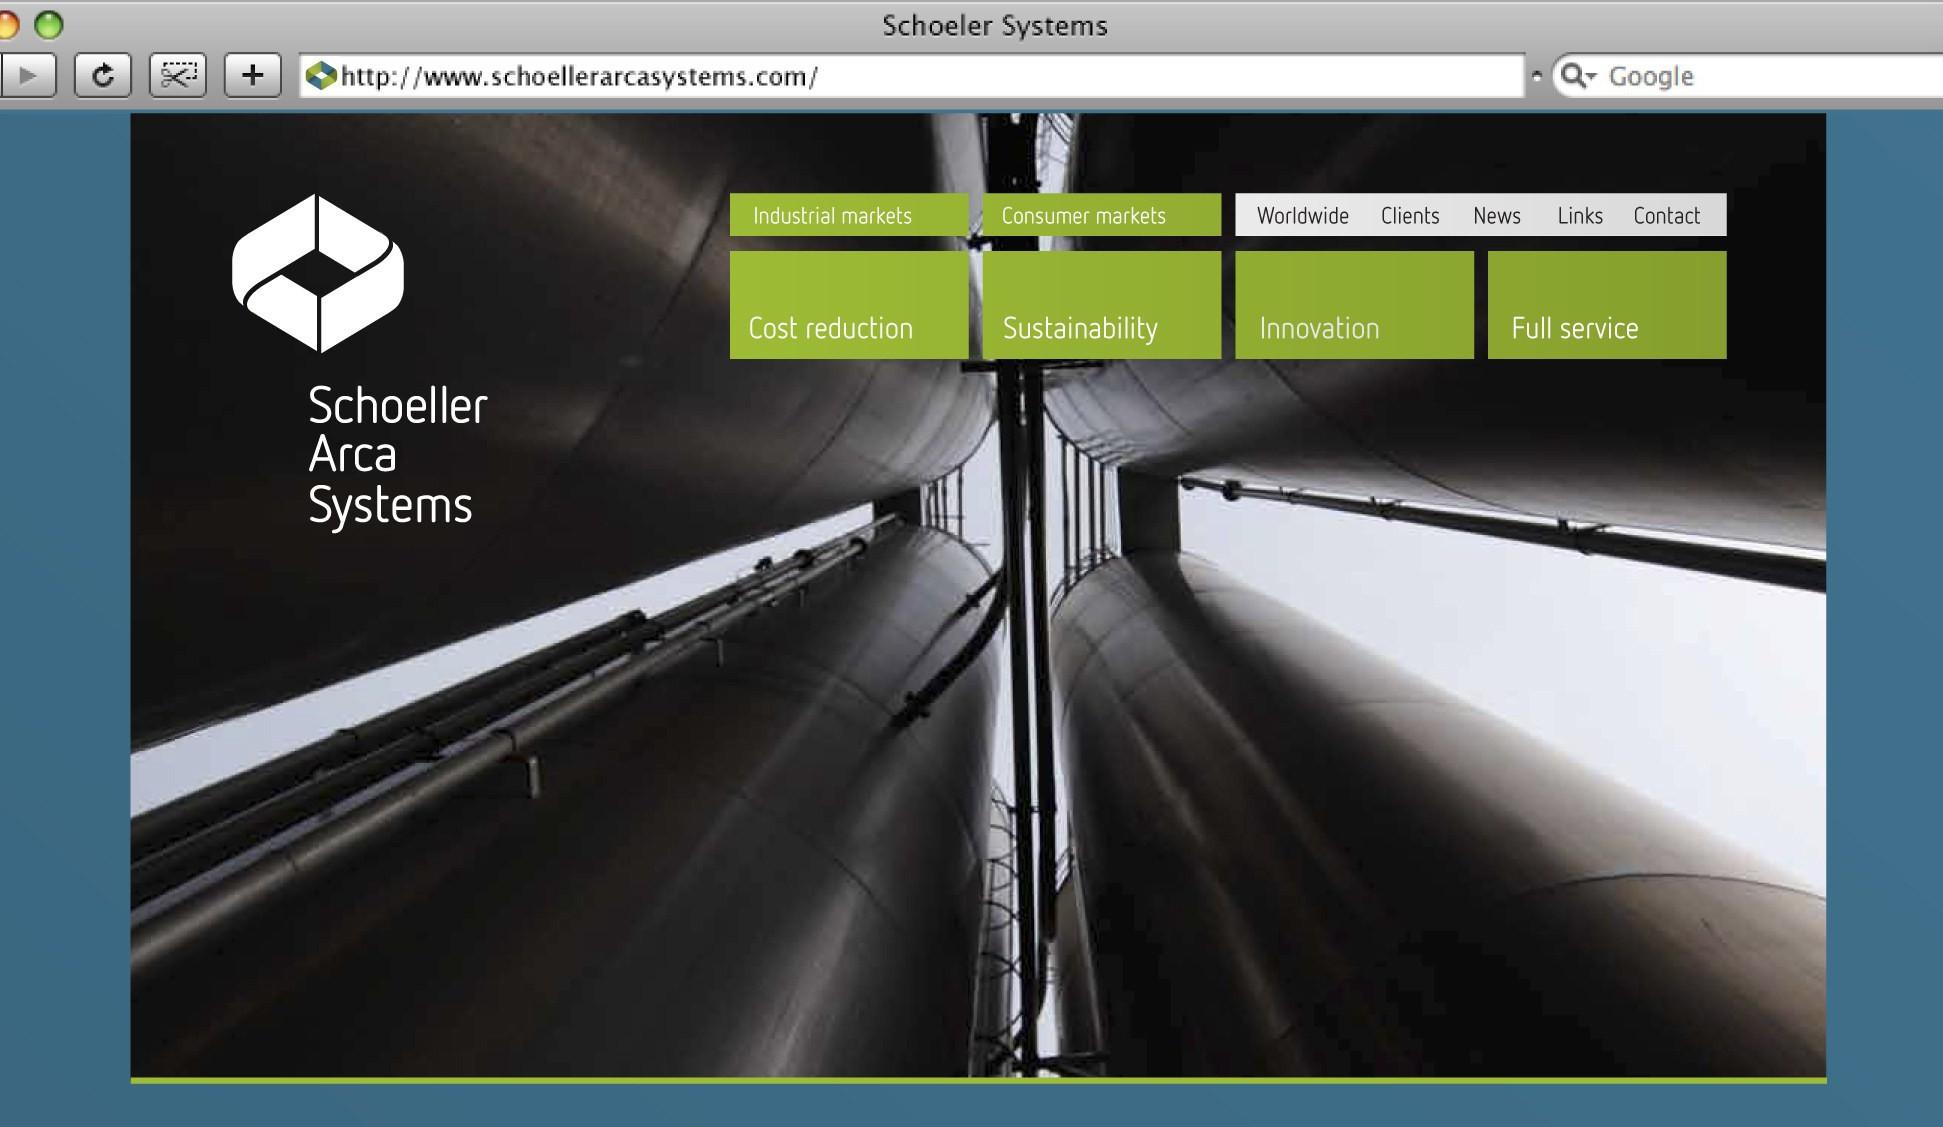 Schoeller Arca Systems